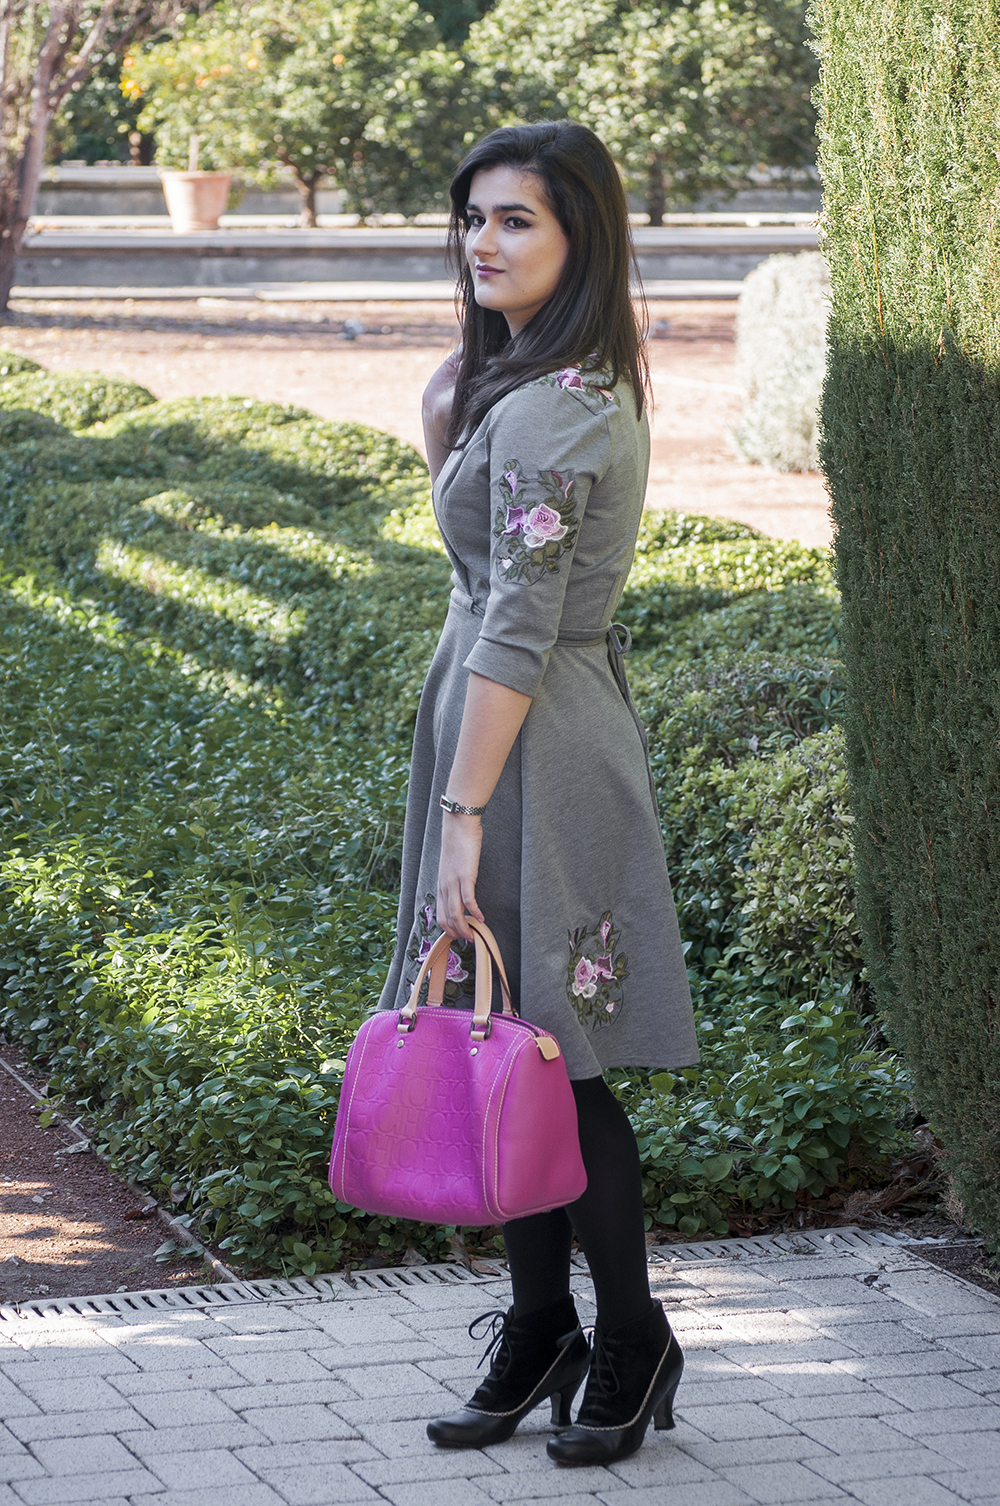 somethingfashion valencia spain fashion blogger, lightinthebox review, christmas dress casual dressy ideas, carolina herrera andy bag pink